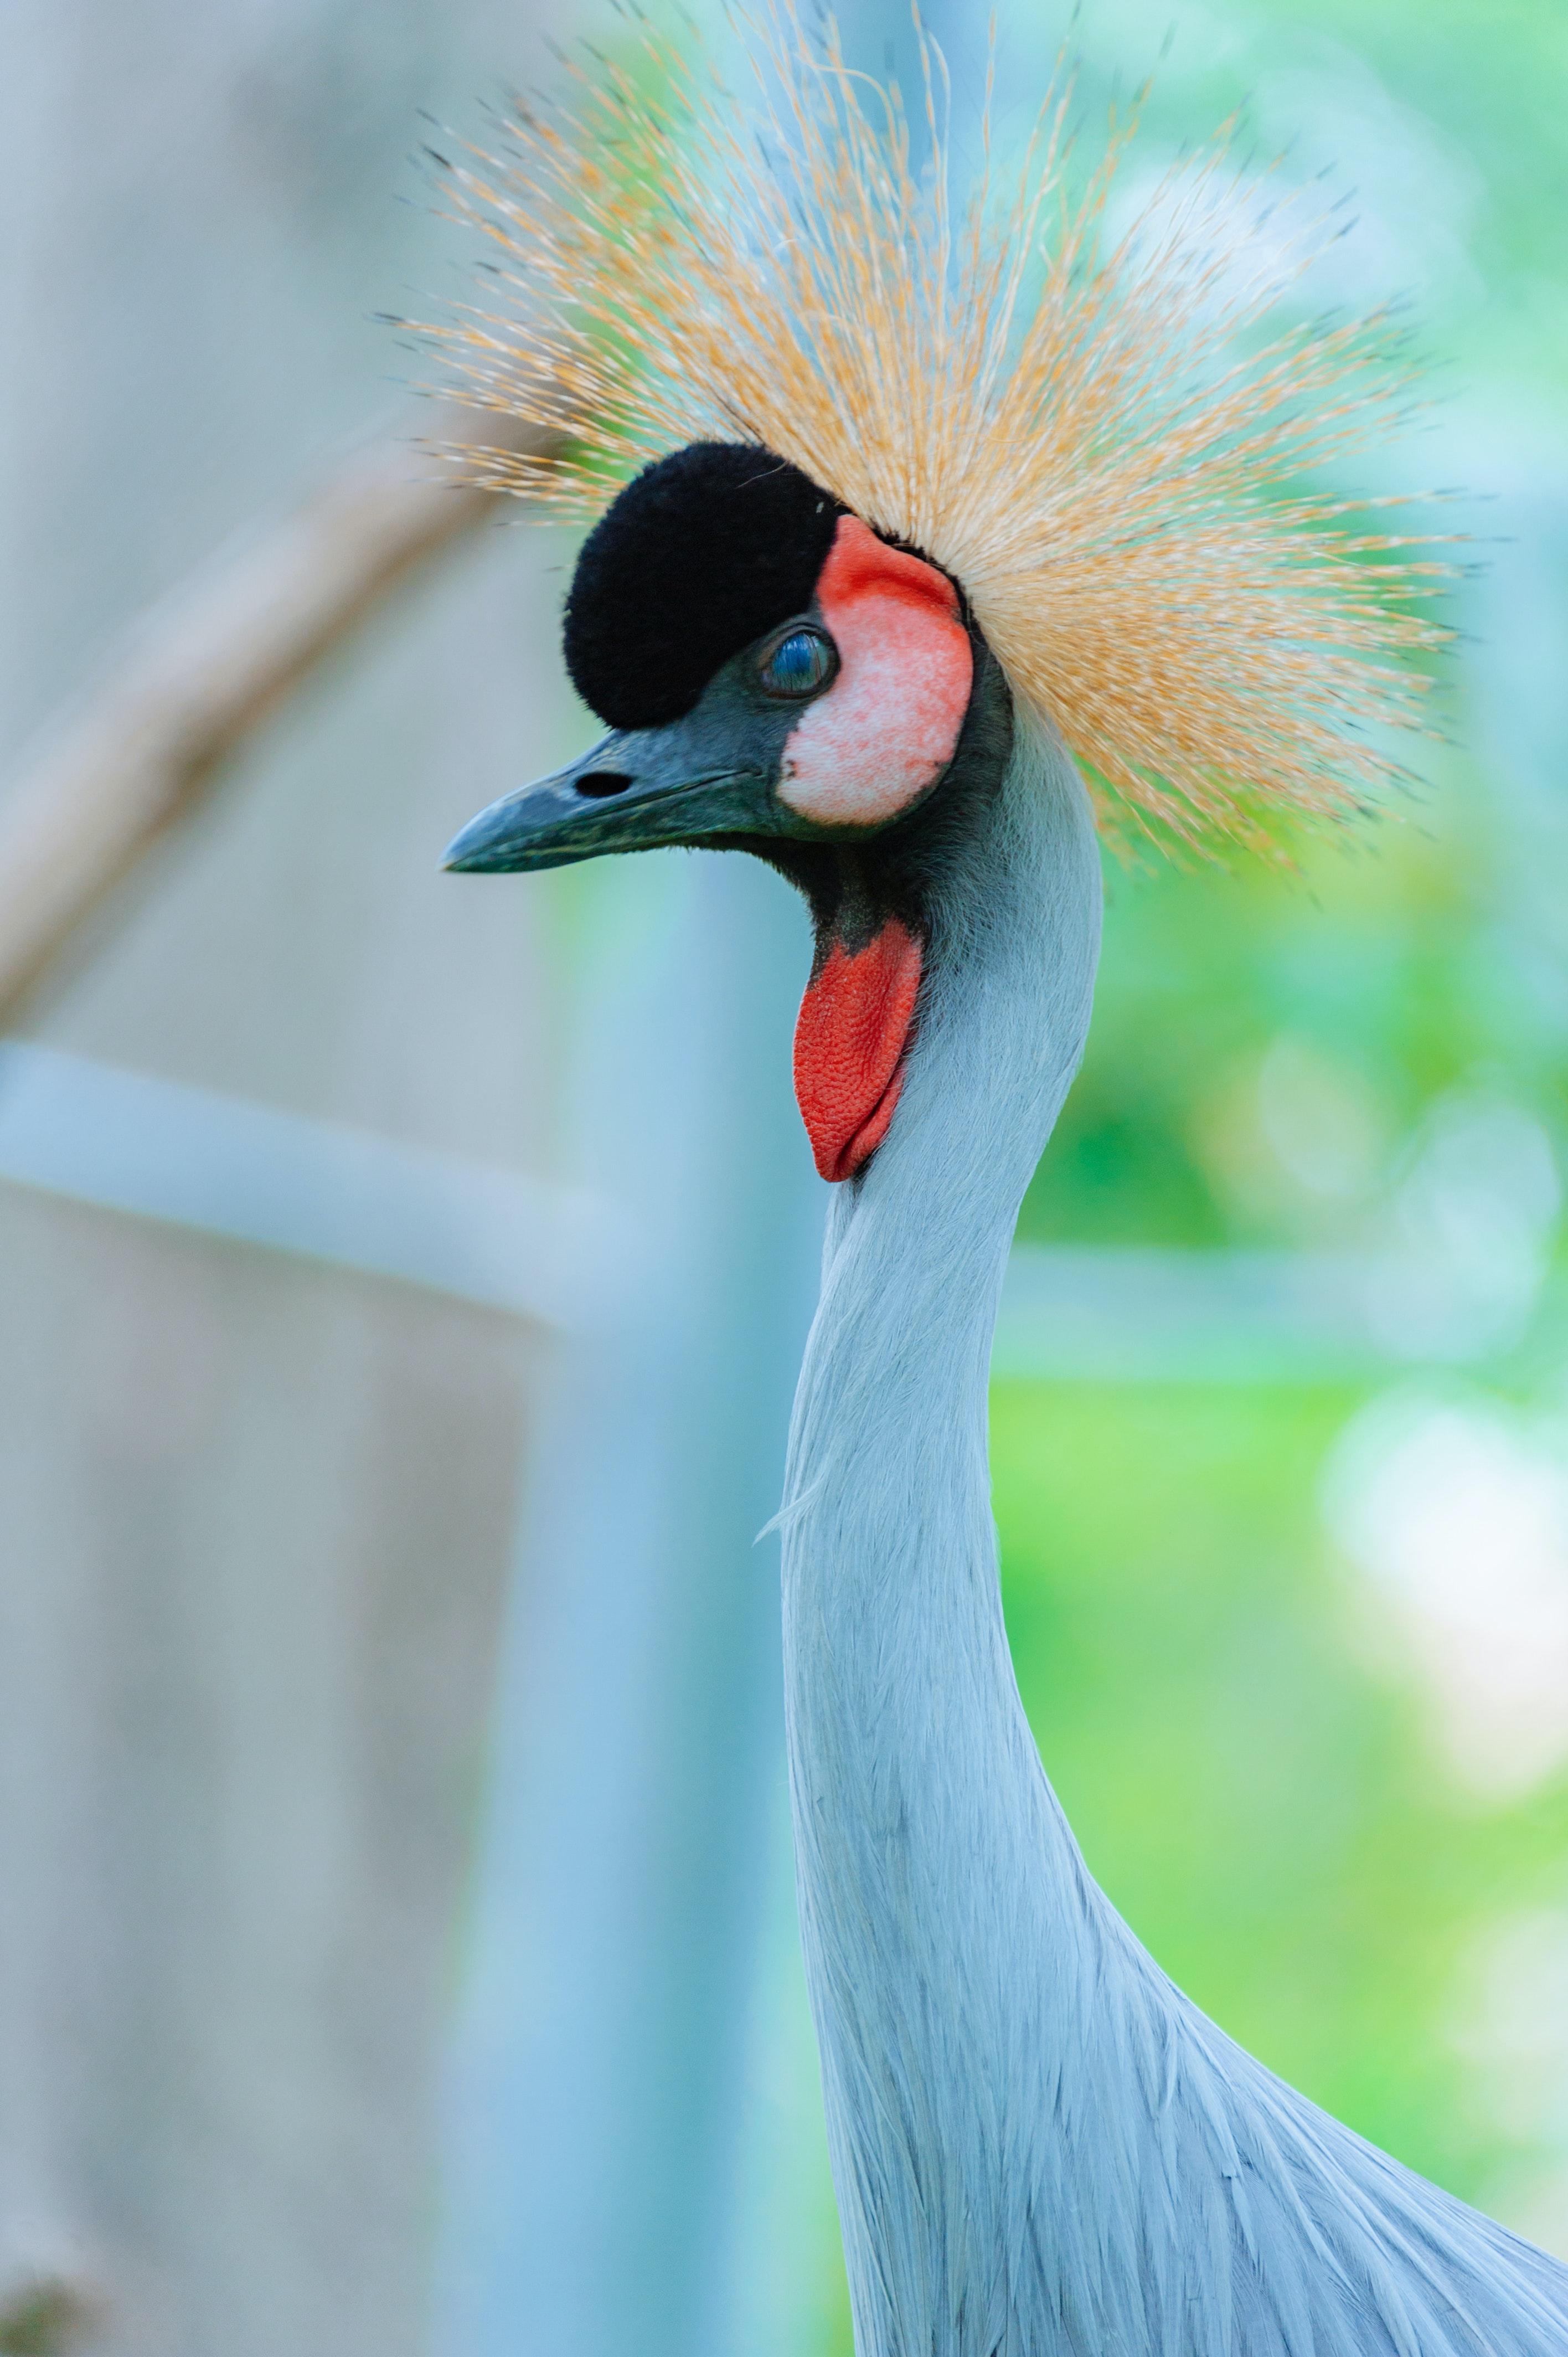 Galah Parrot 183 Free Stock Photo